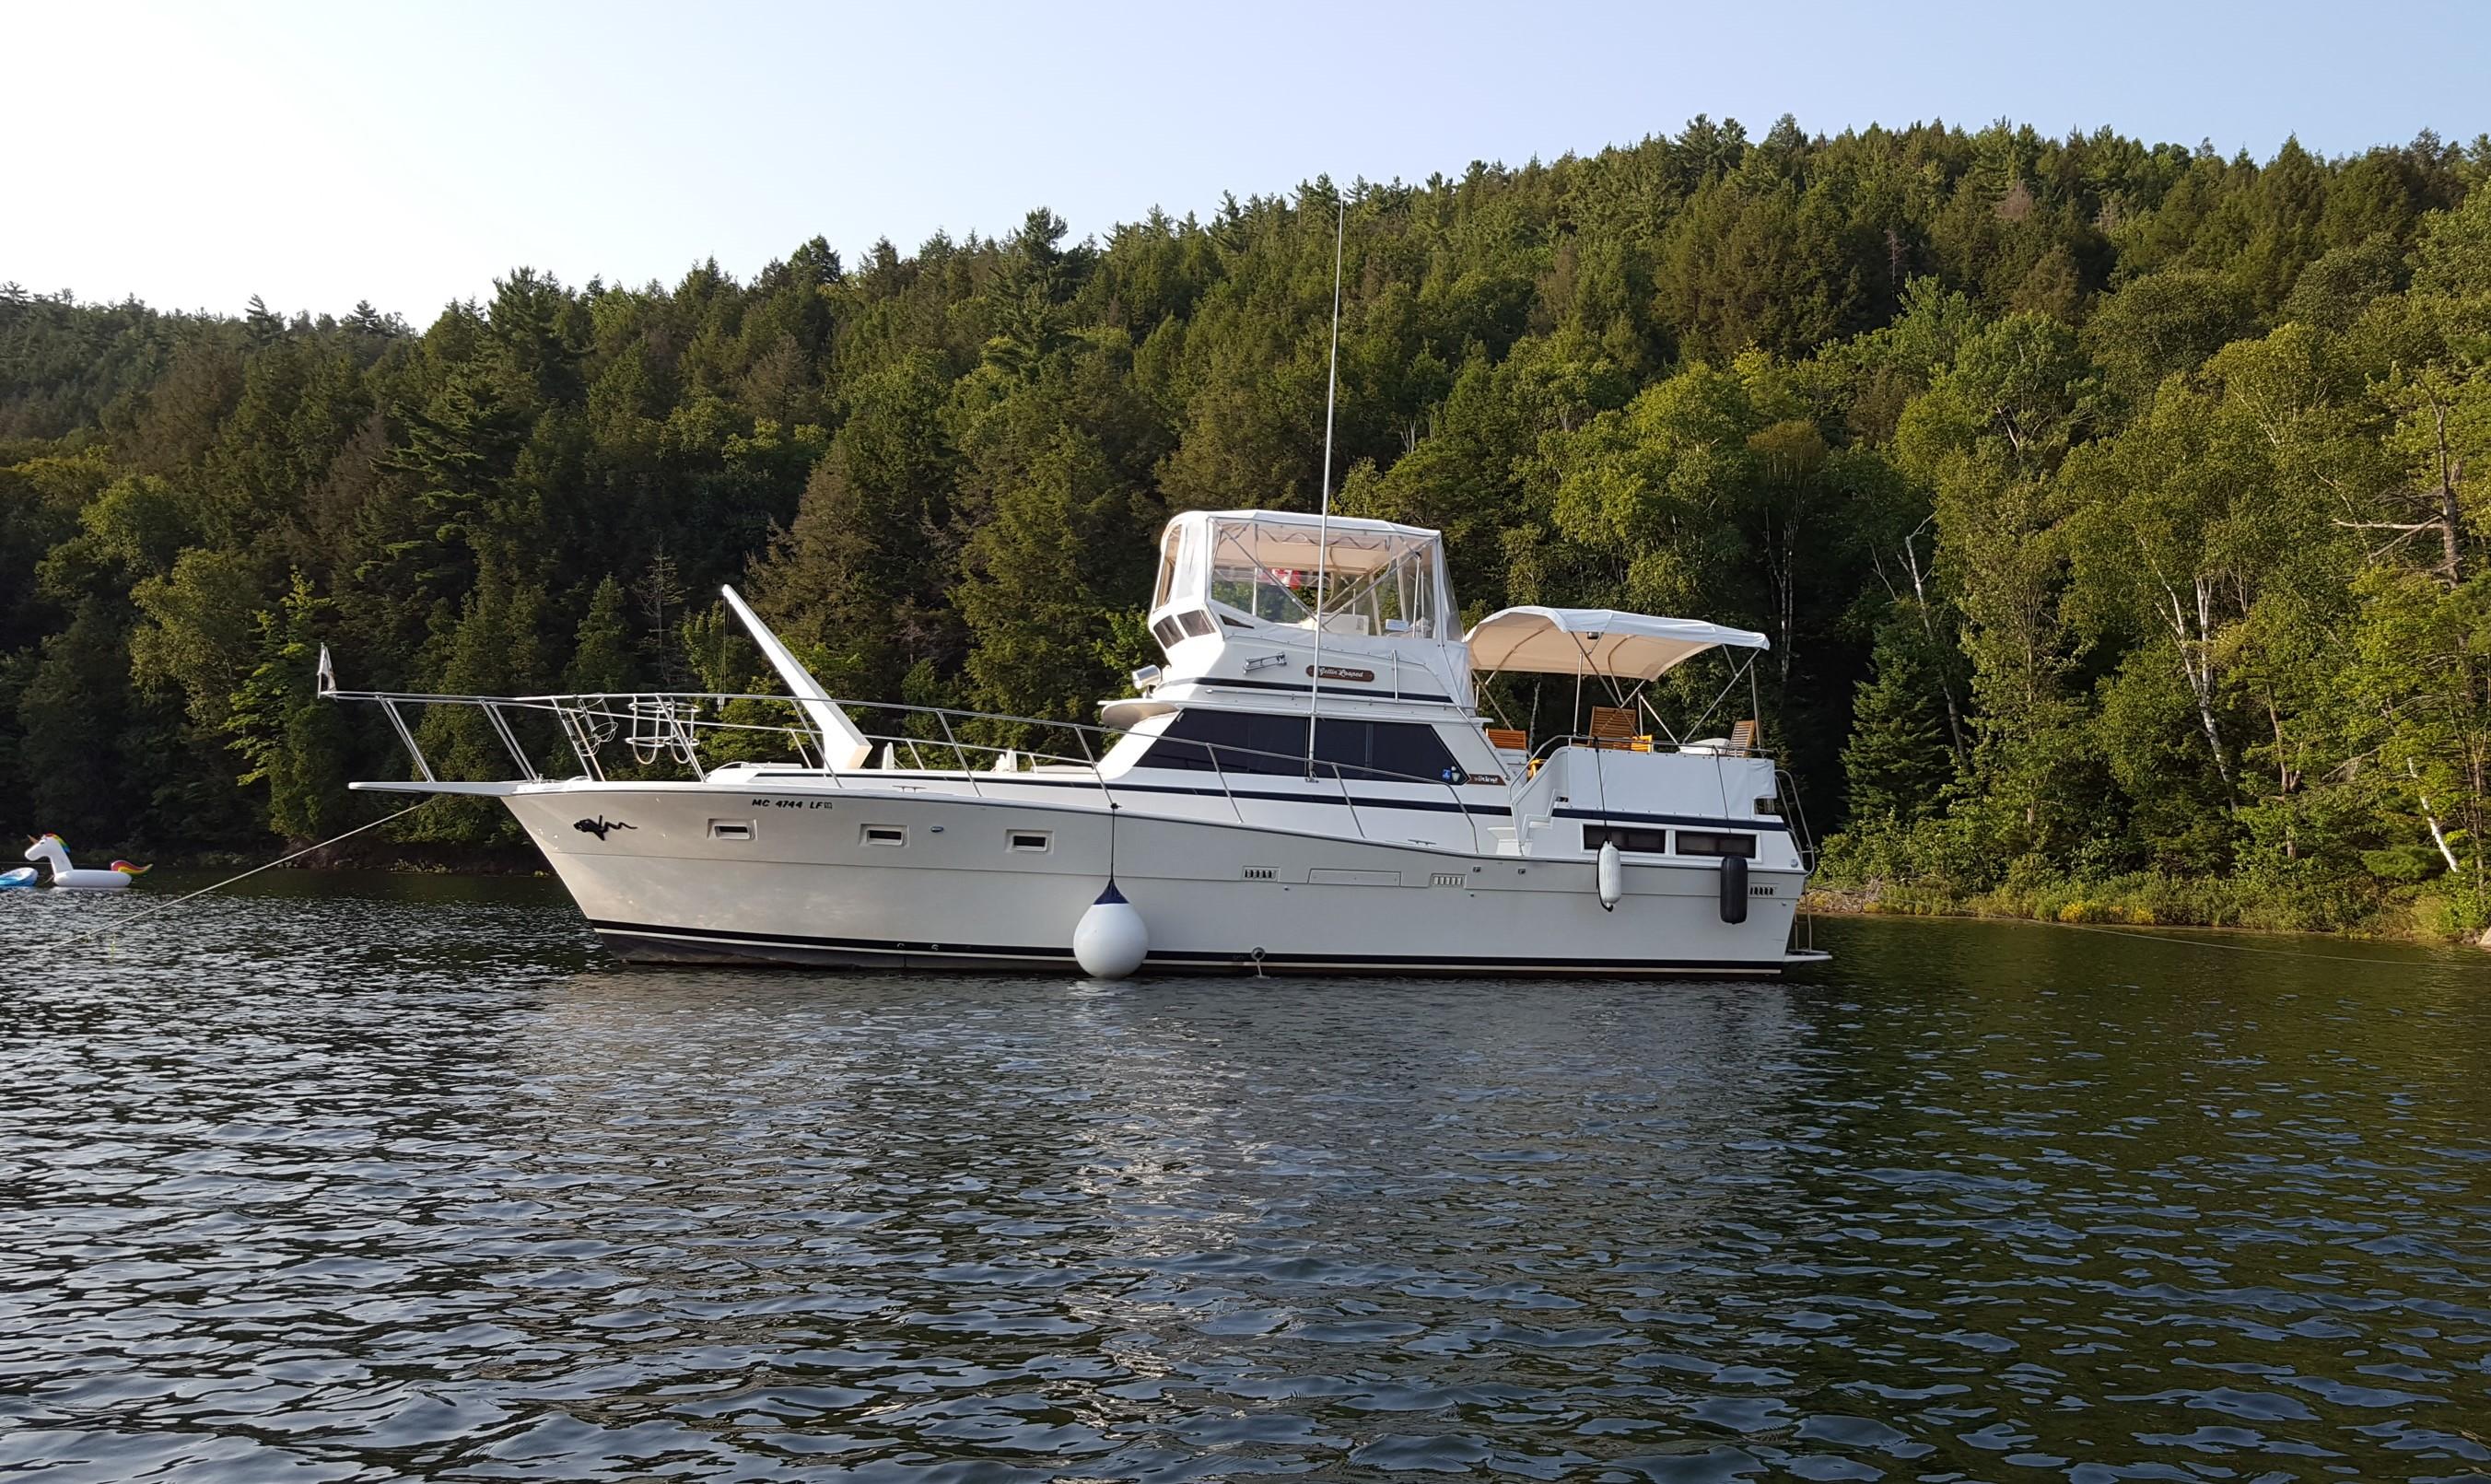 Viking 43 Double Cabin Motor Yacht Viking 1980 43 Double Cabin